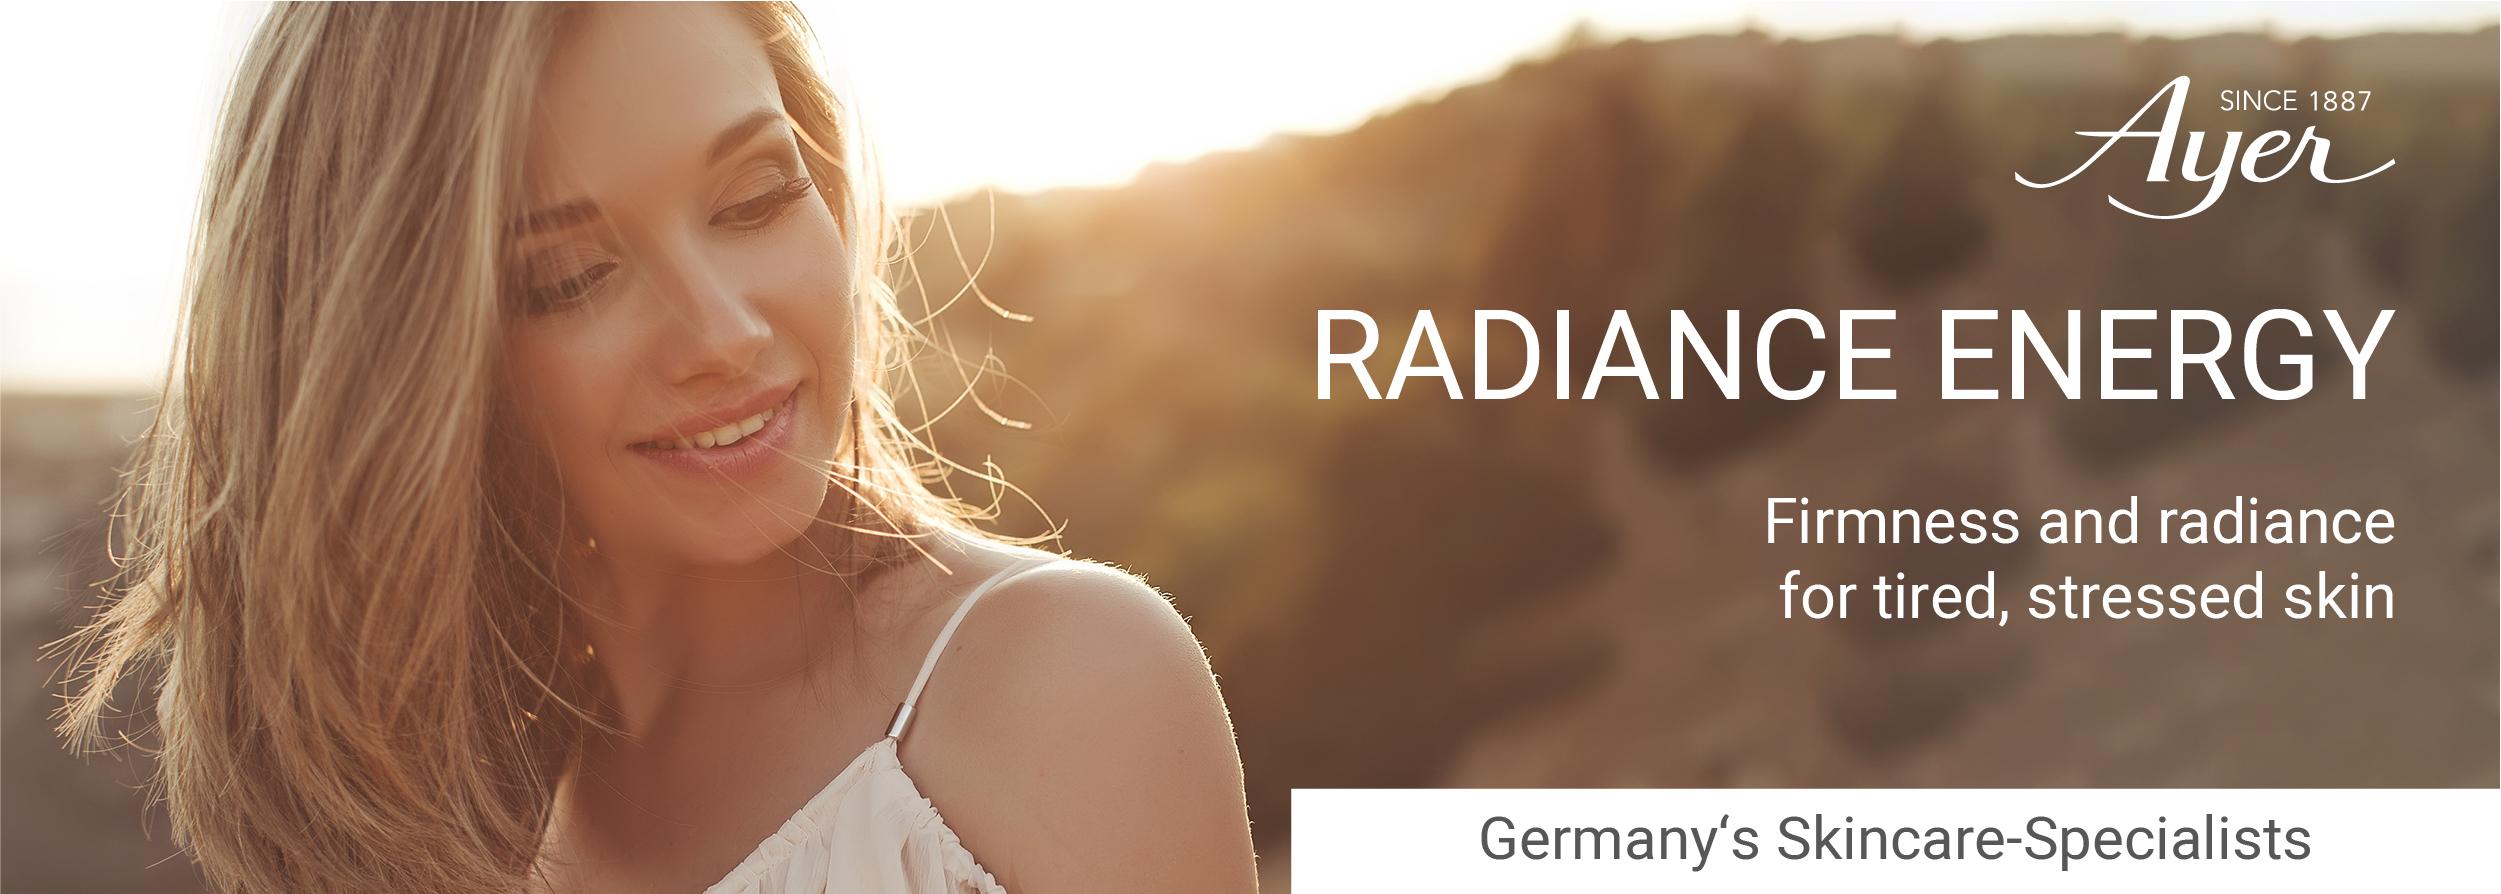 Ayer_Linien_RadianceEnergy_EN_Slider_2500x893px_RGB_V1-0_01-03-2021